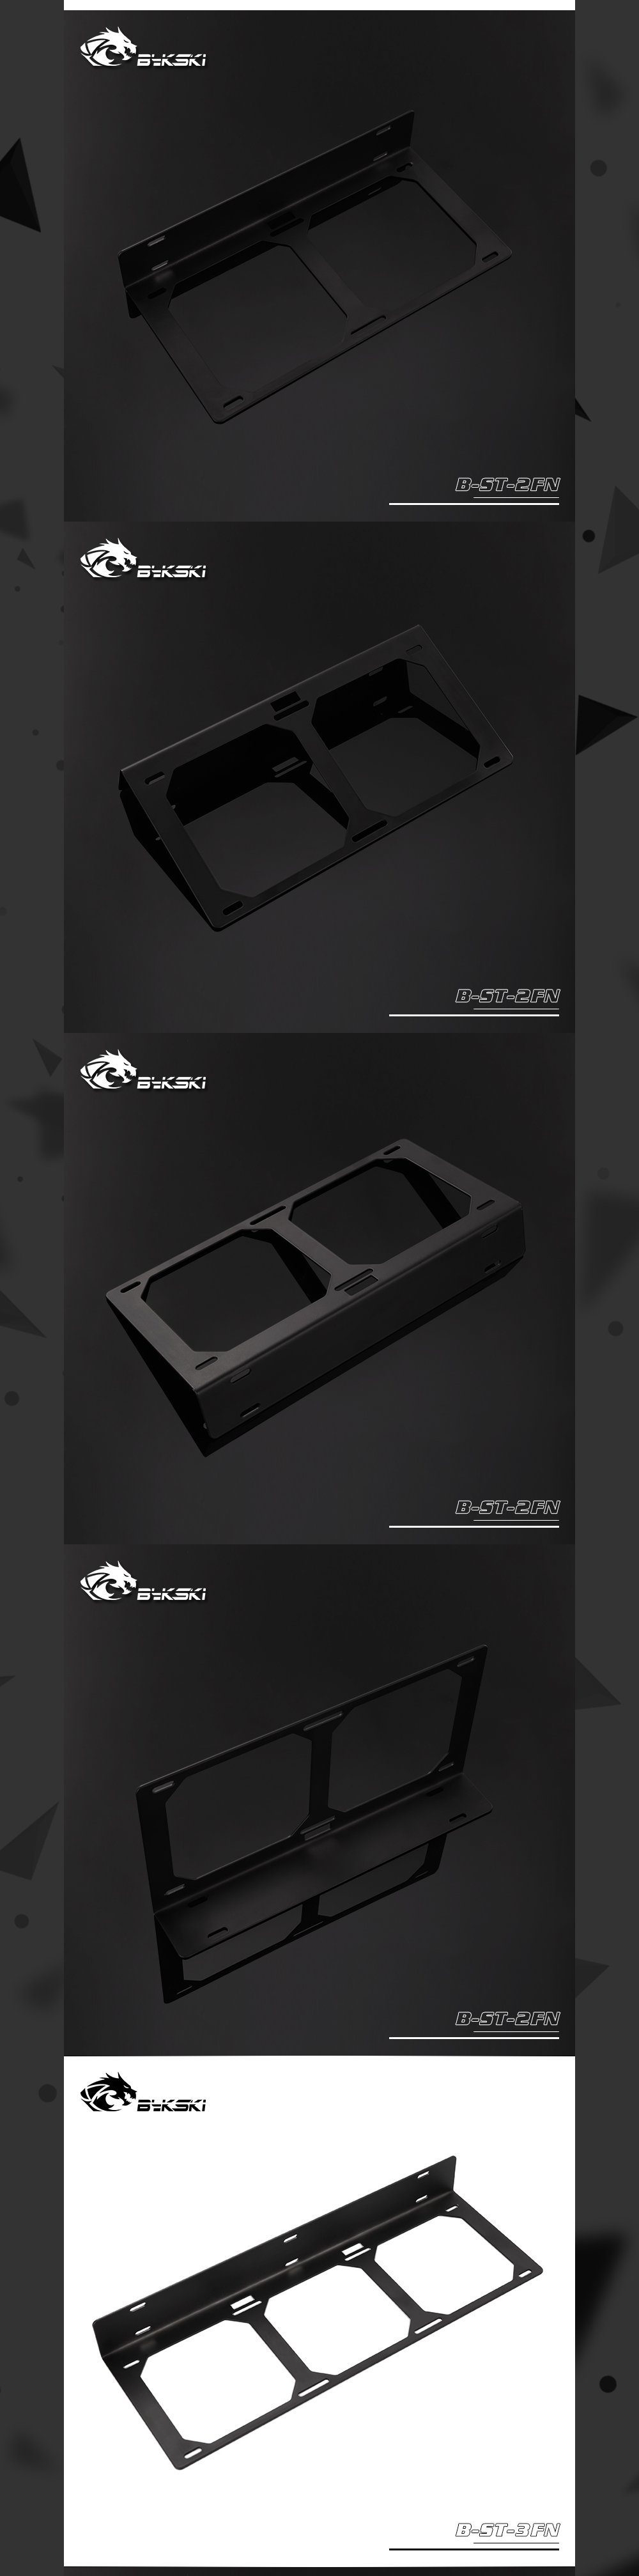 Bykski B-ST-FN, Fan/Radiator Brackets, Suitable For 12cm Fans 120/240/360 Radiator,